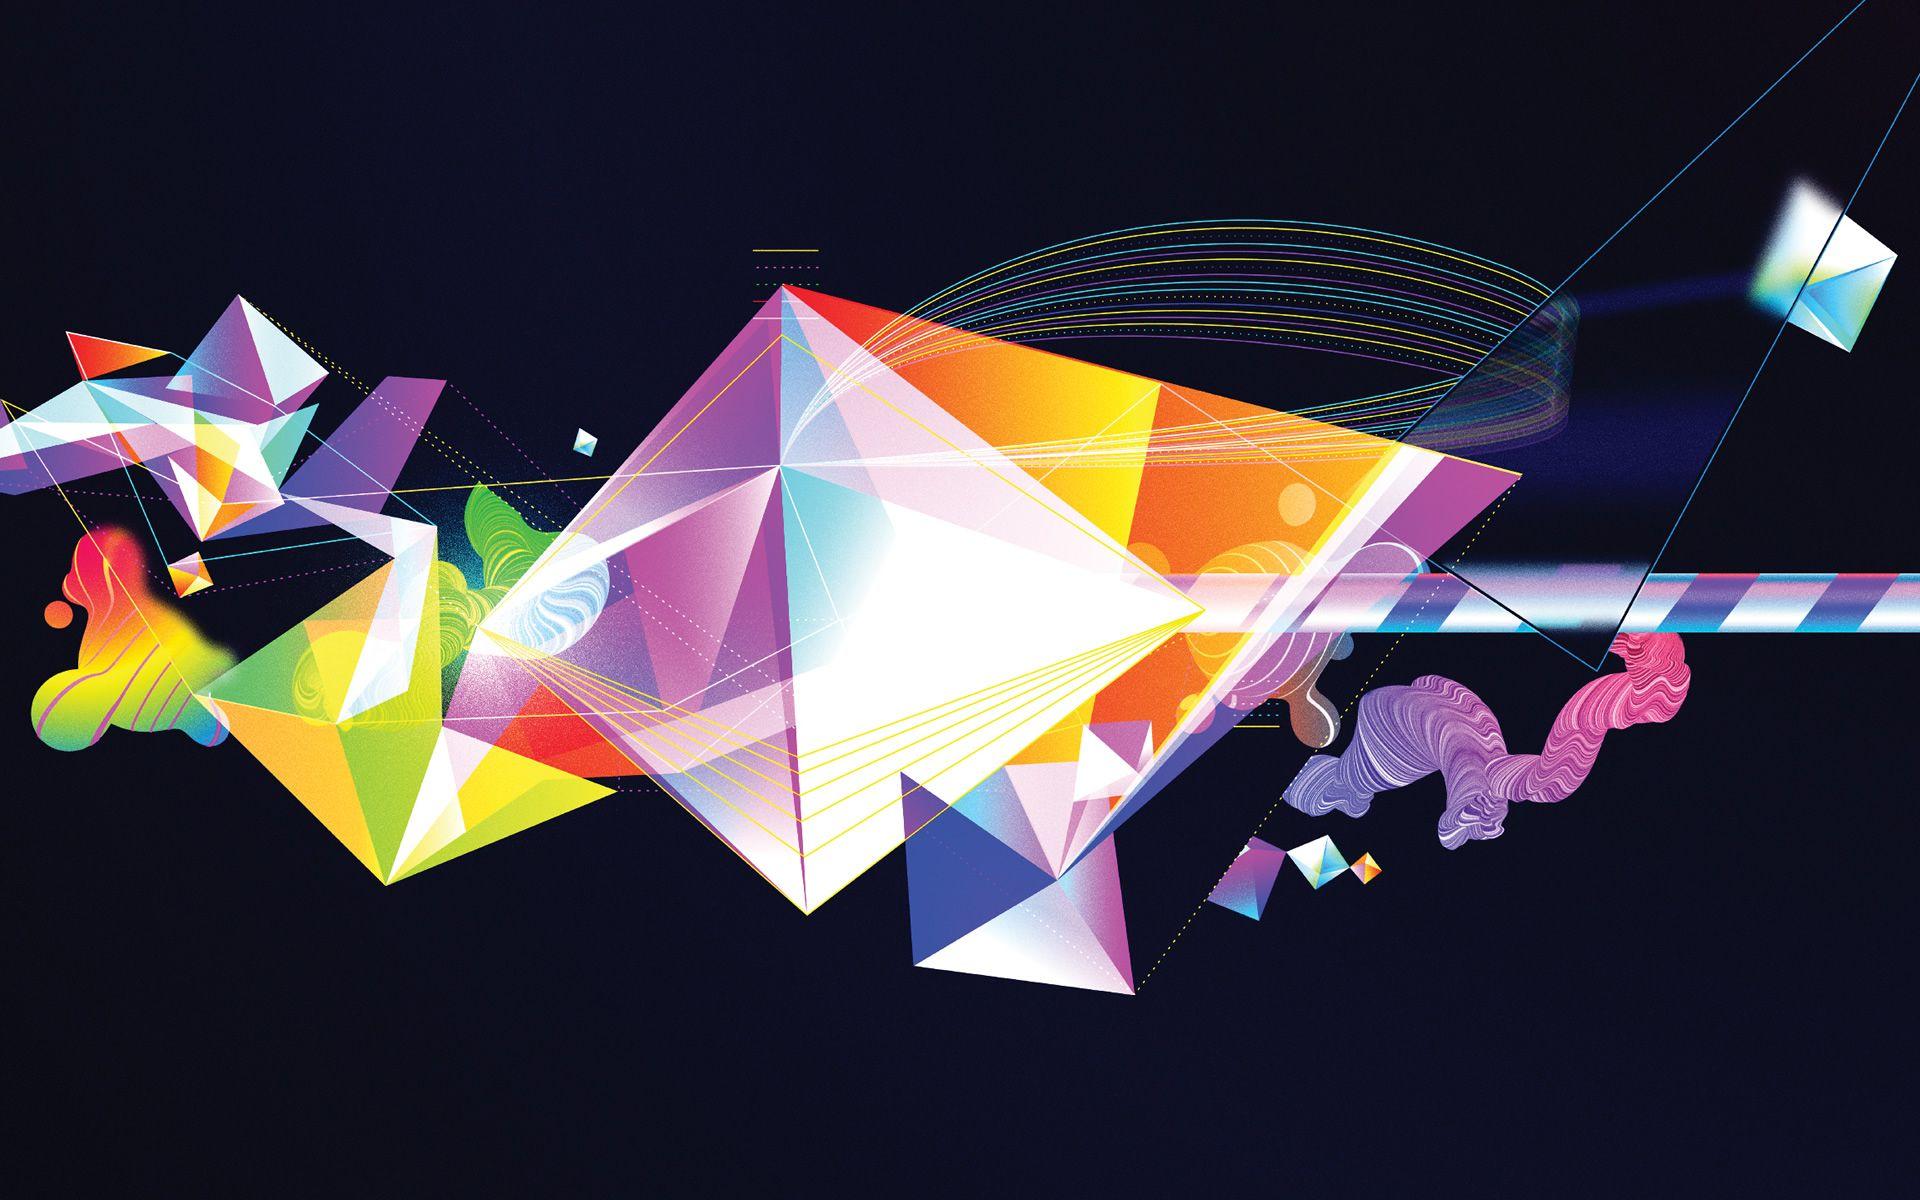 Top Wallpaper High Resolution Mathematics - 4013ad507c279a1f7fa5175e0aa0e790  Collection_1285.jpg